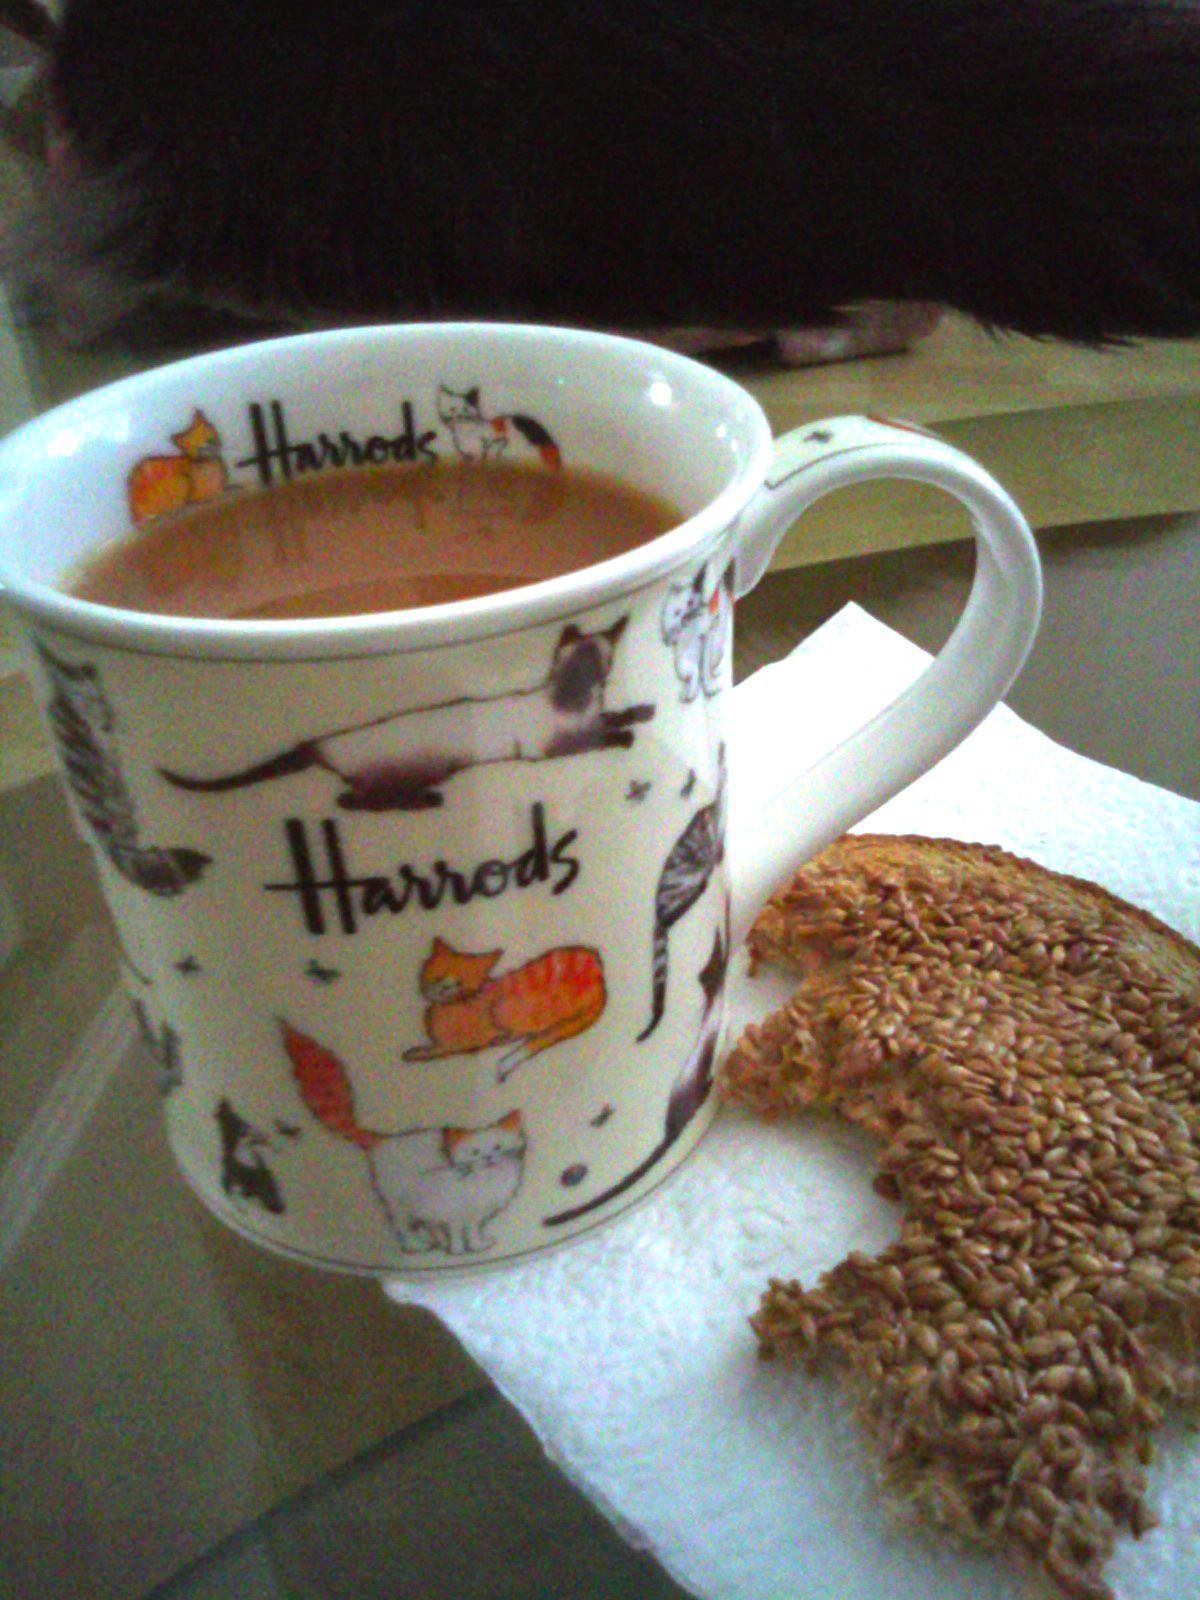 Having a comforting, hot cup of tea from Harrod's! Tea